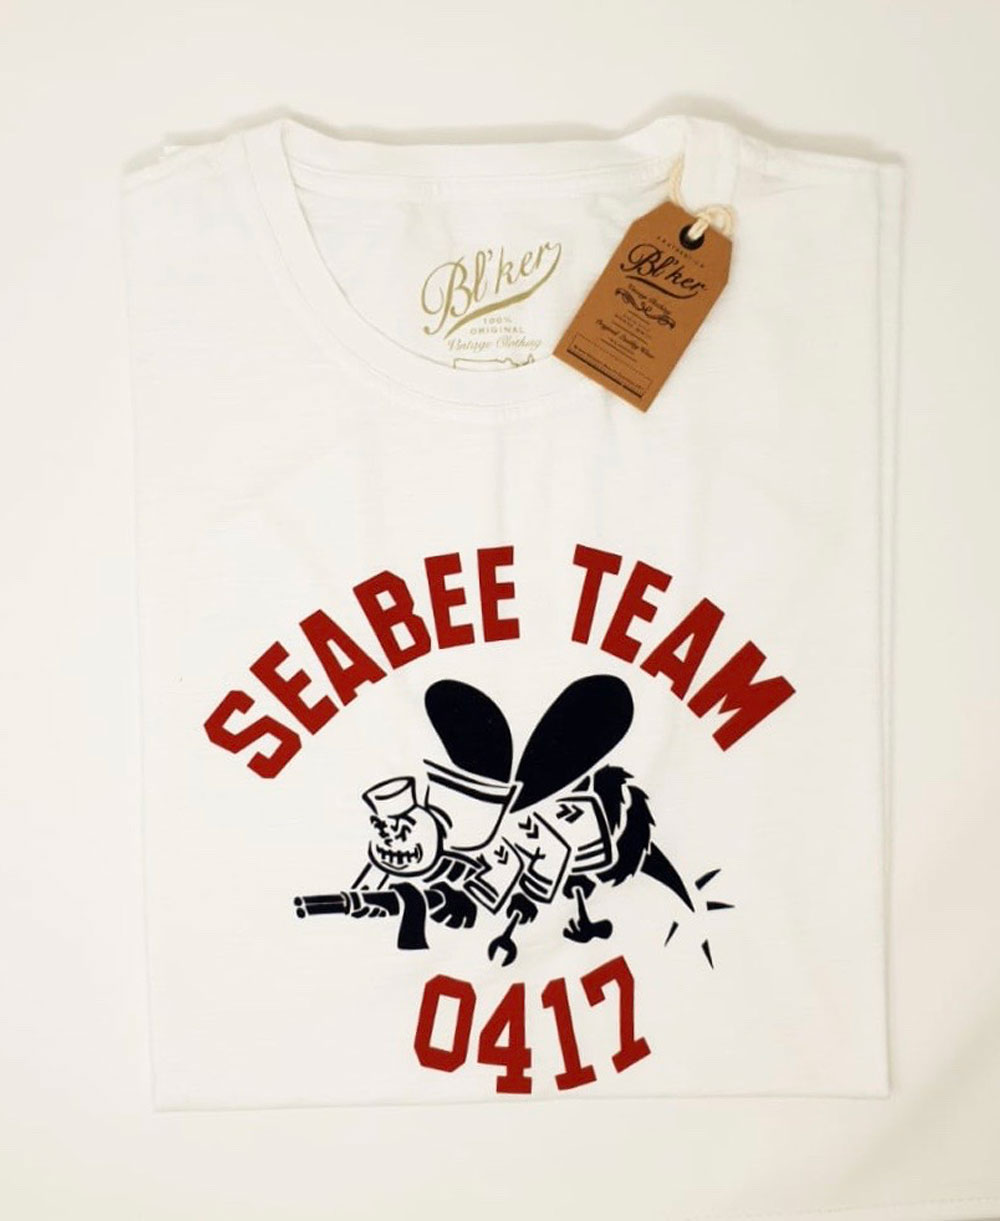 Seabees Team T-Shirt Manica Corta Uomo White